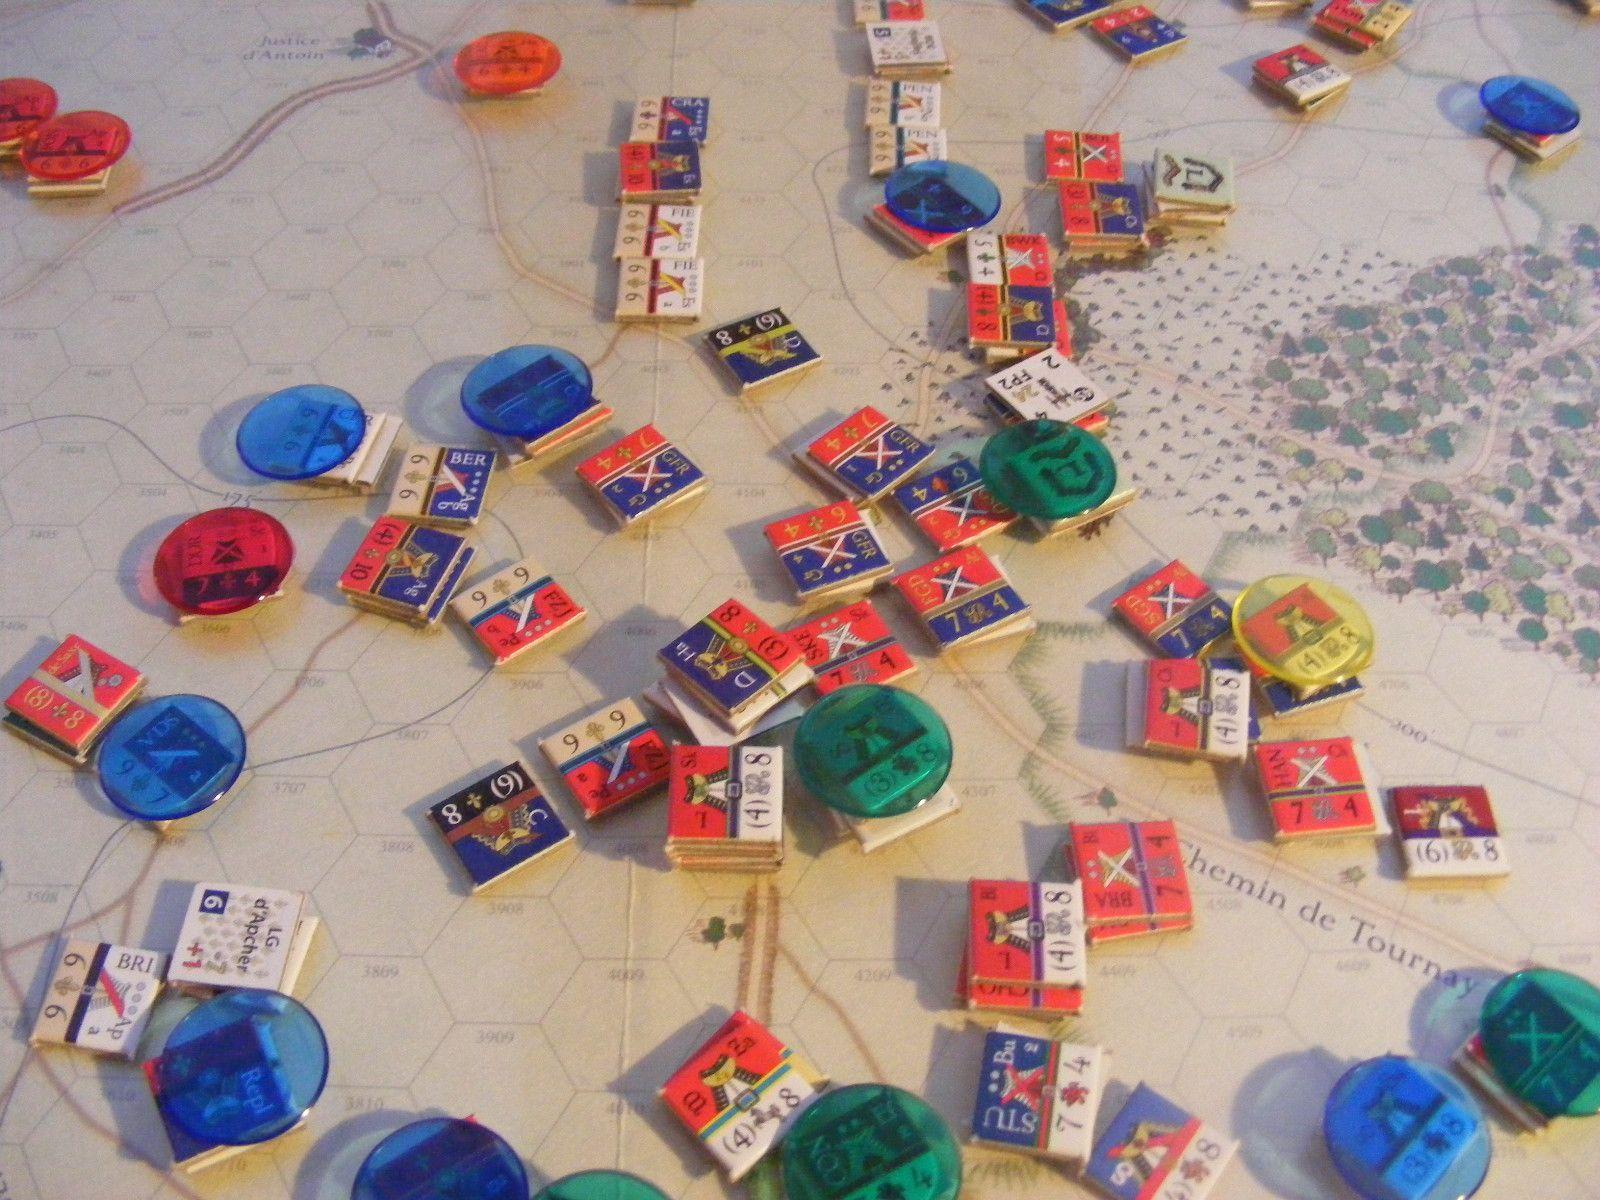 Fontenoy Scenario 5 0800 to 0900 | The Battle of Fontenoy